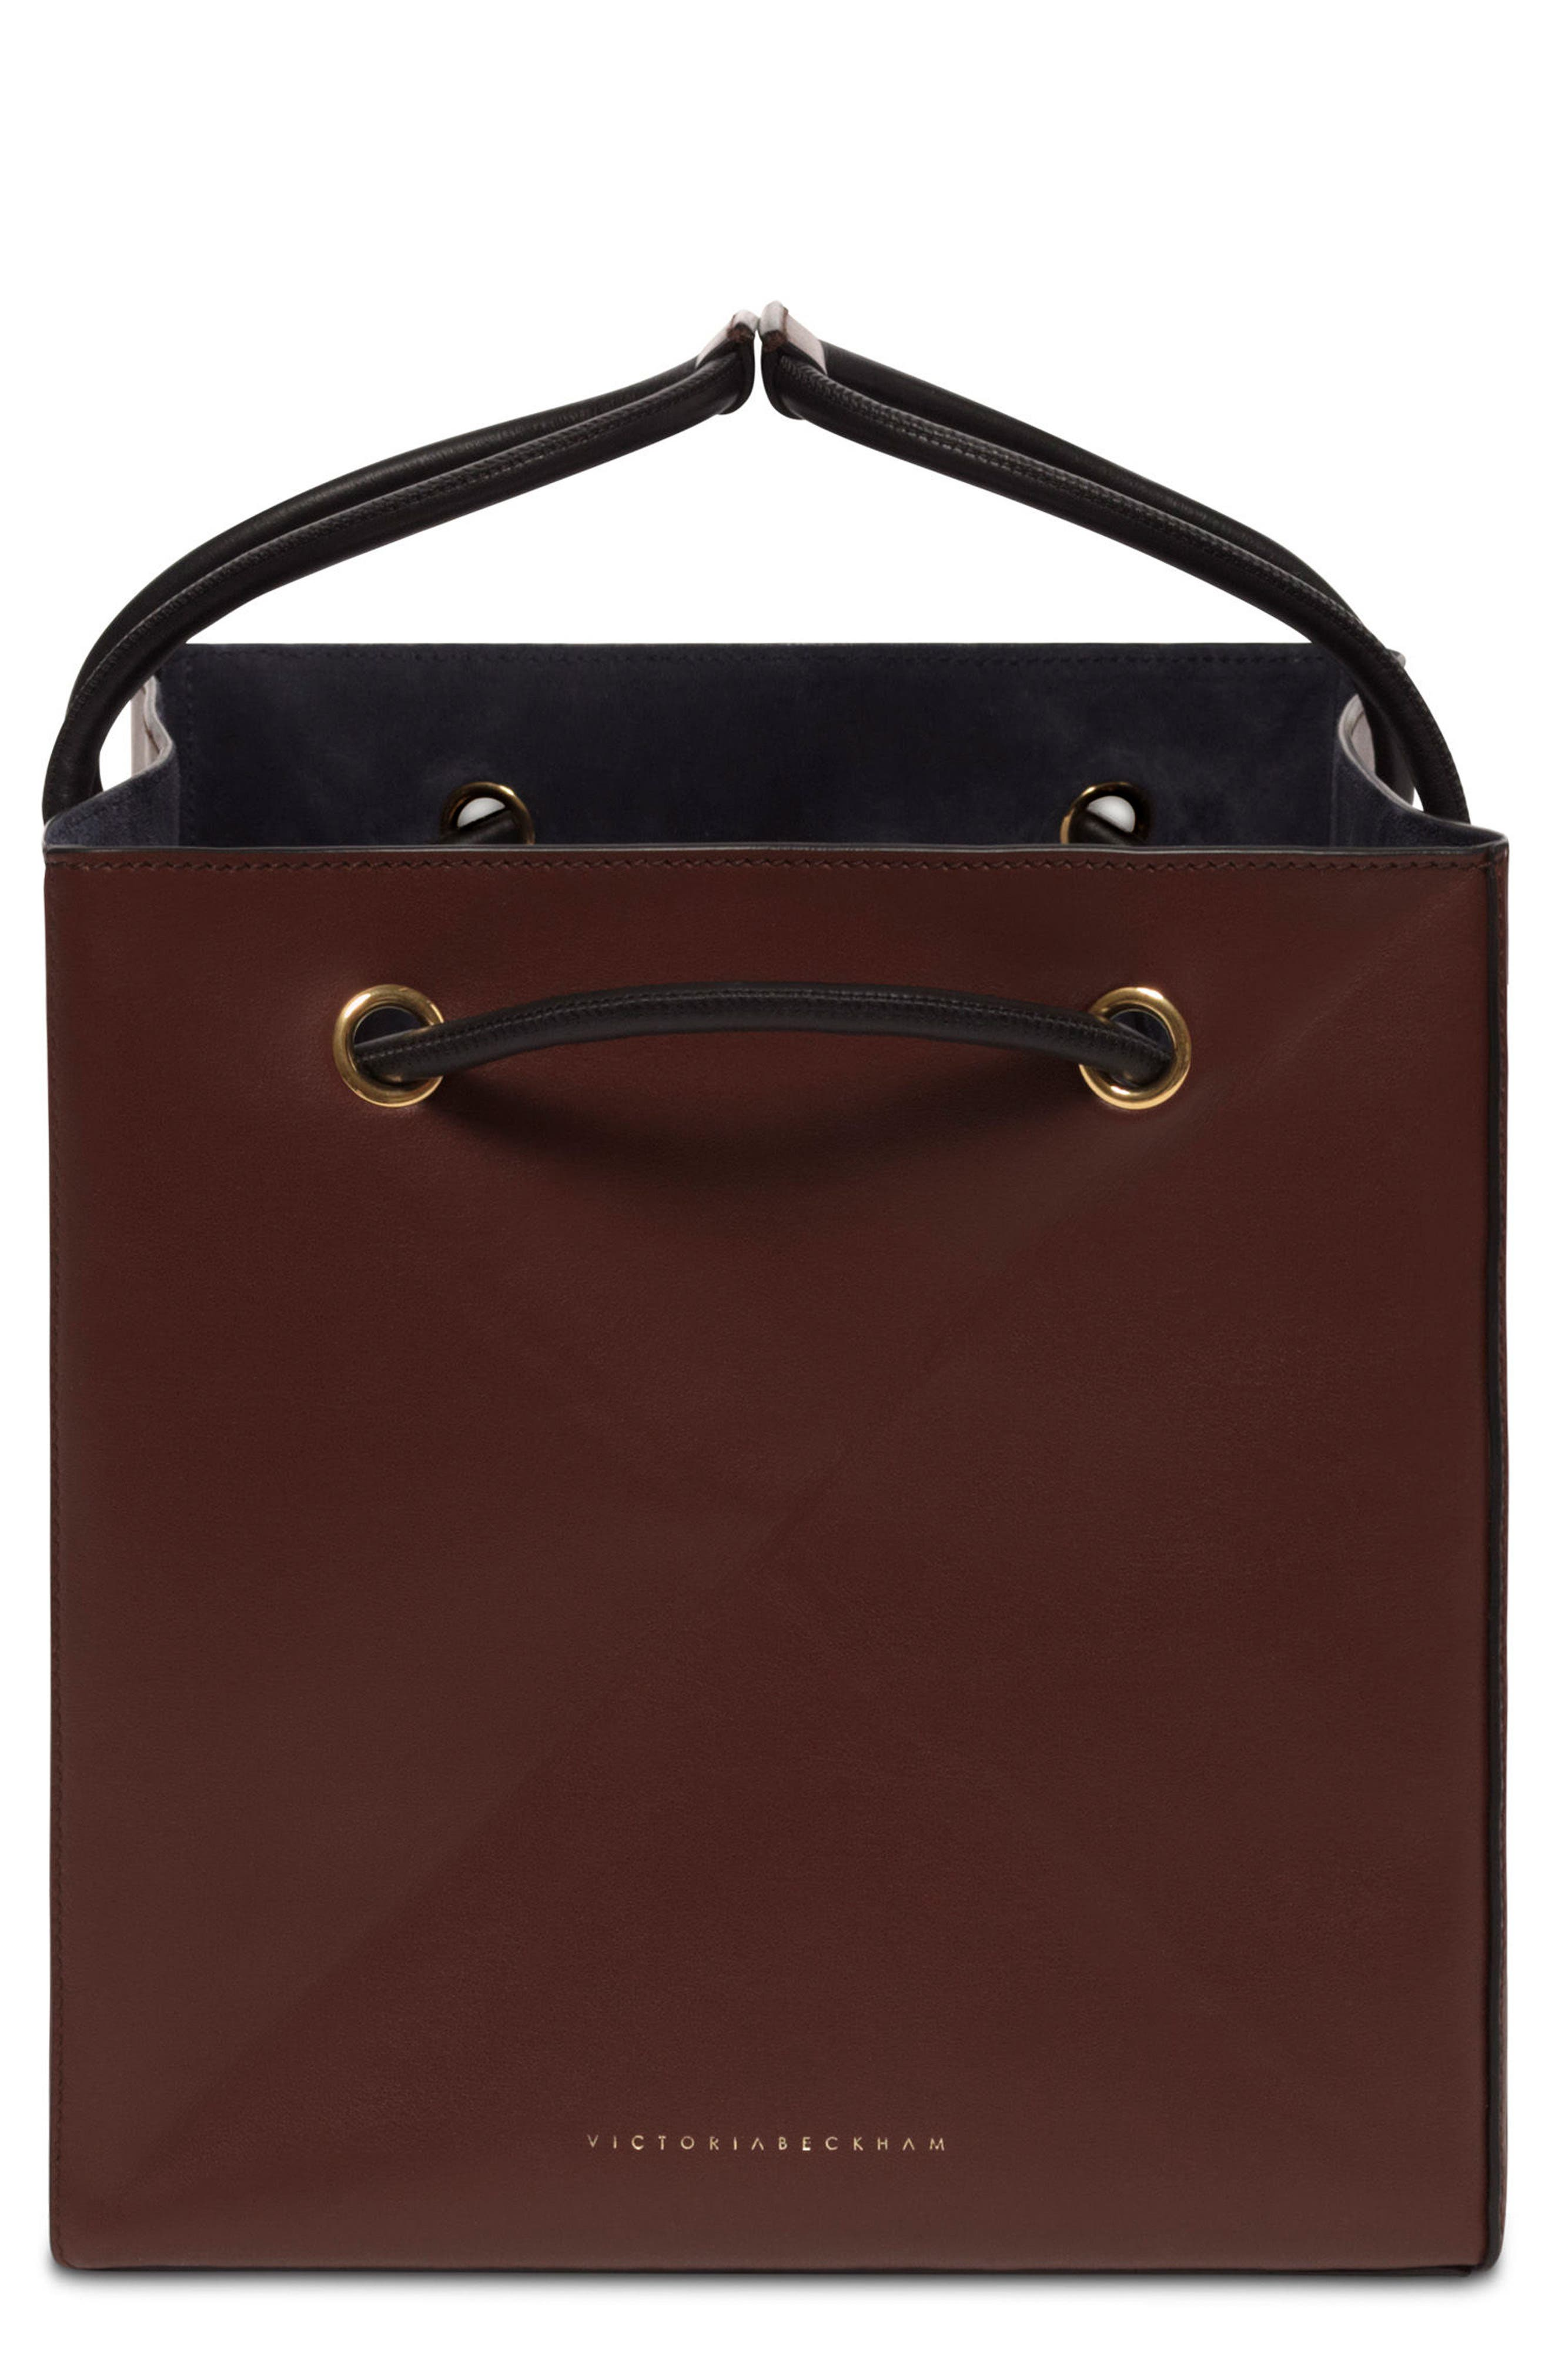 Main Image - Victoria Beckham Small Cube Bag